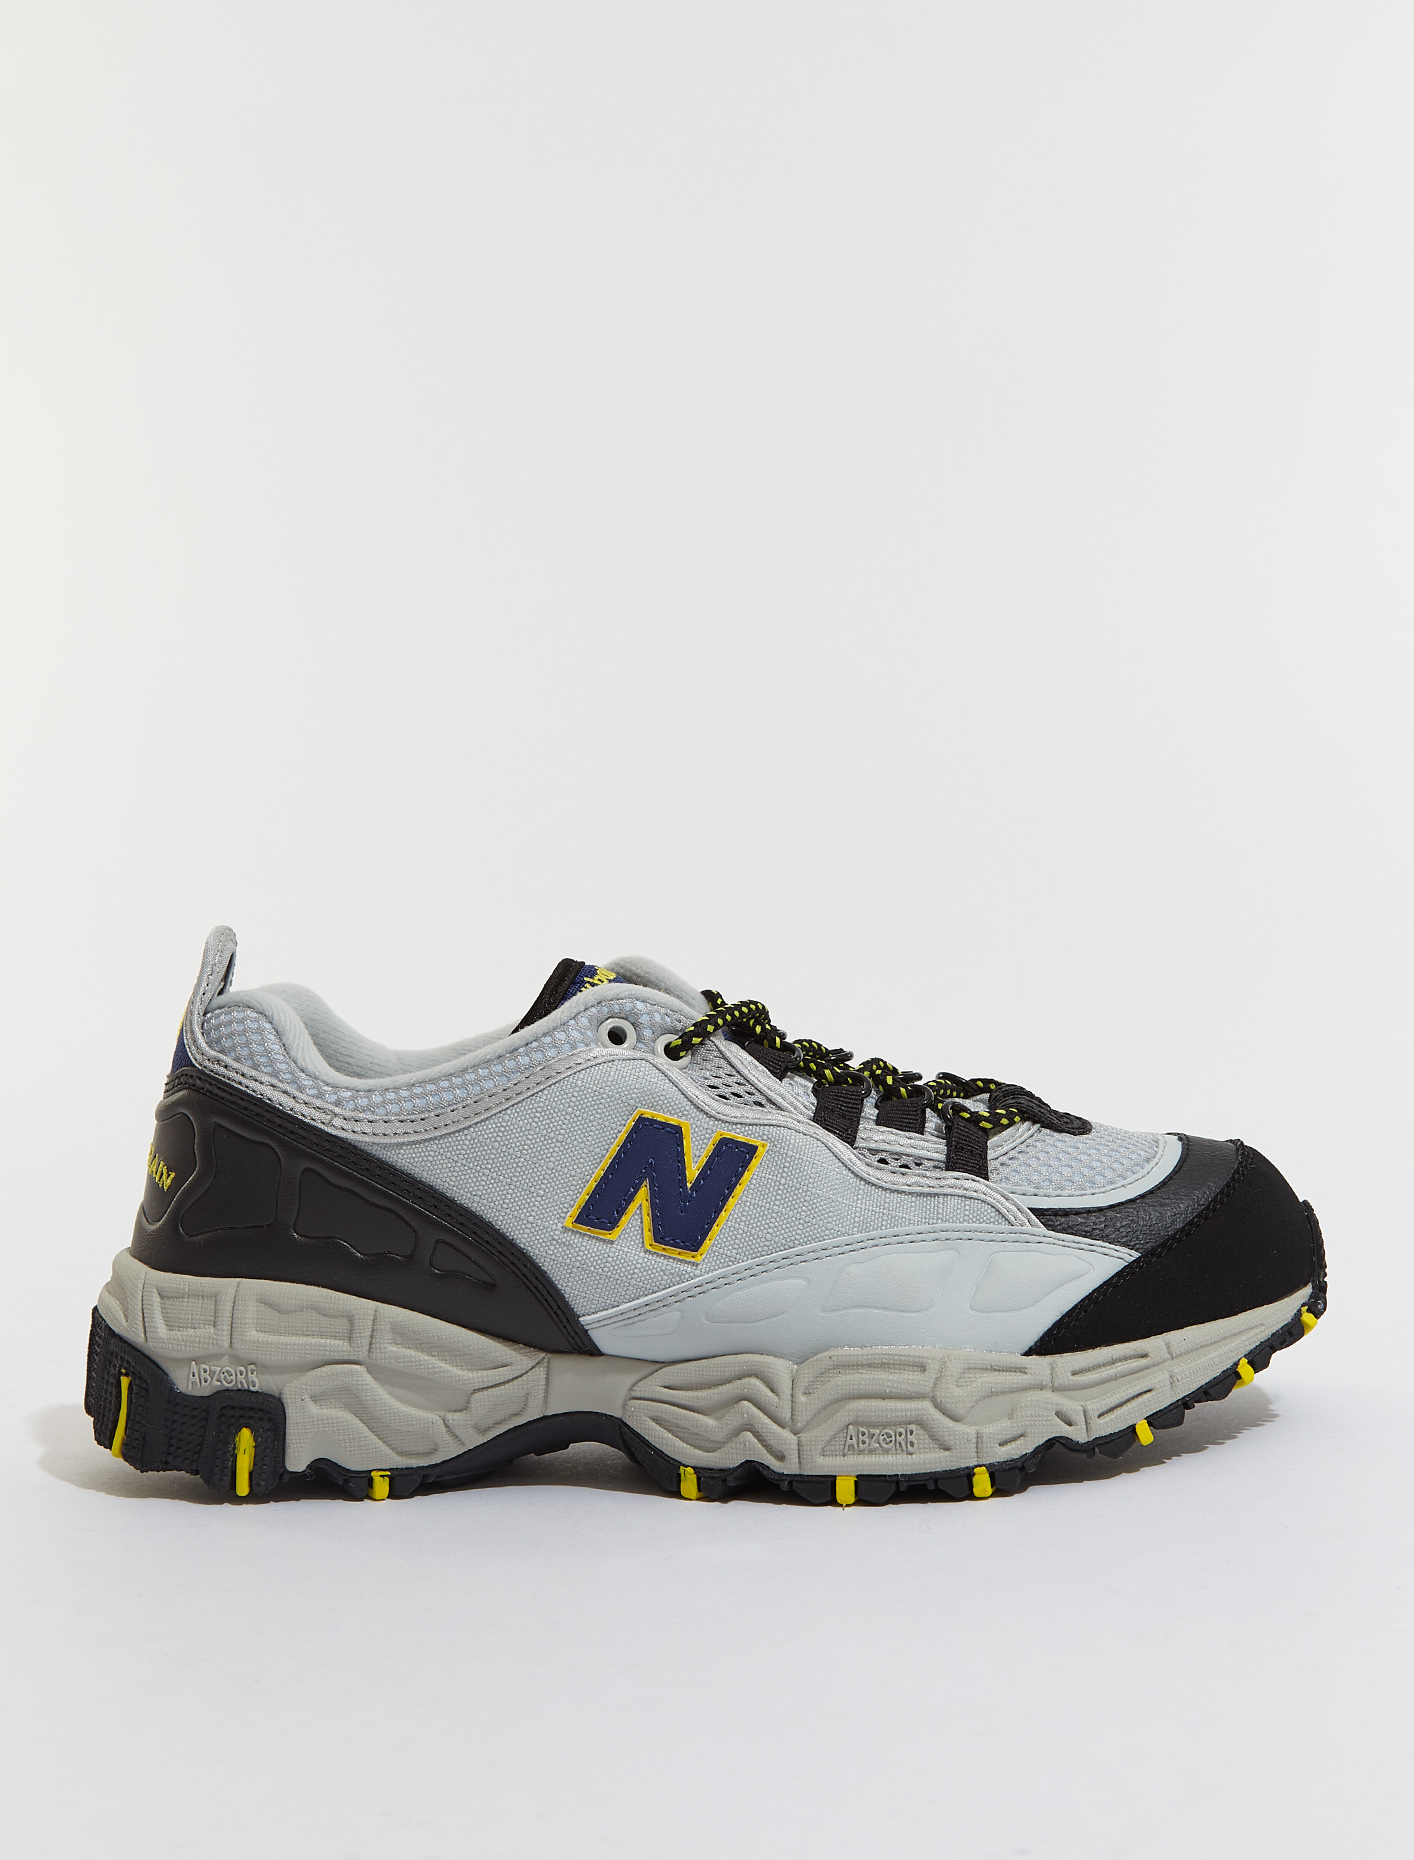 M801 Sneaker in Grey & Black